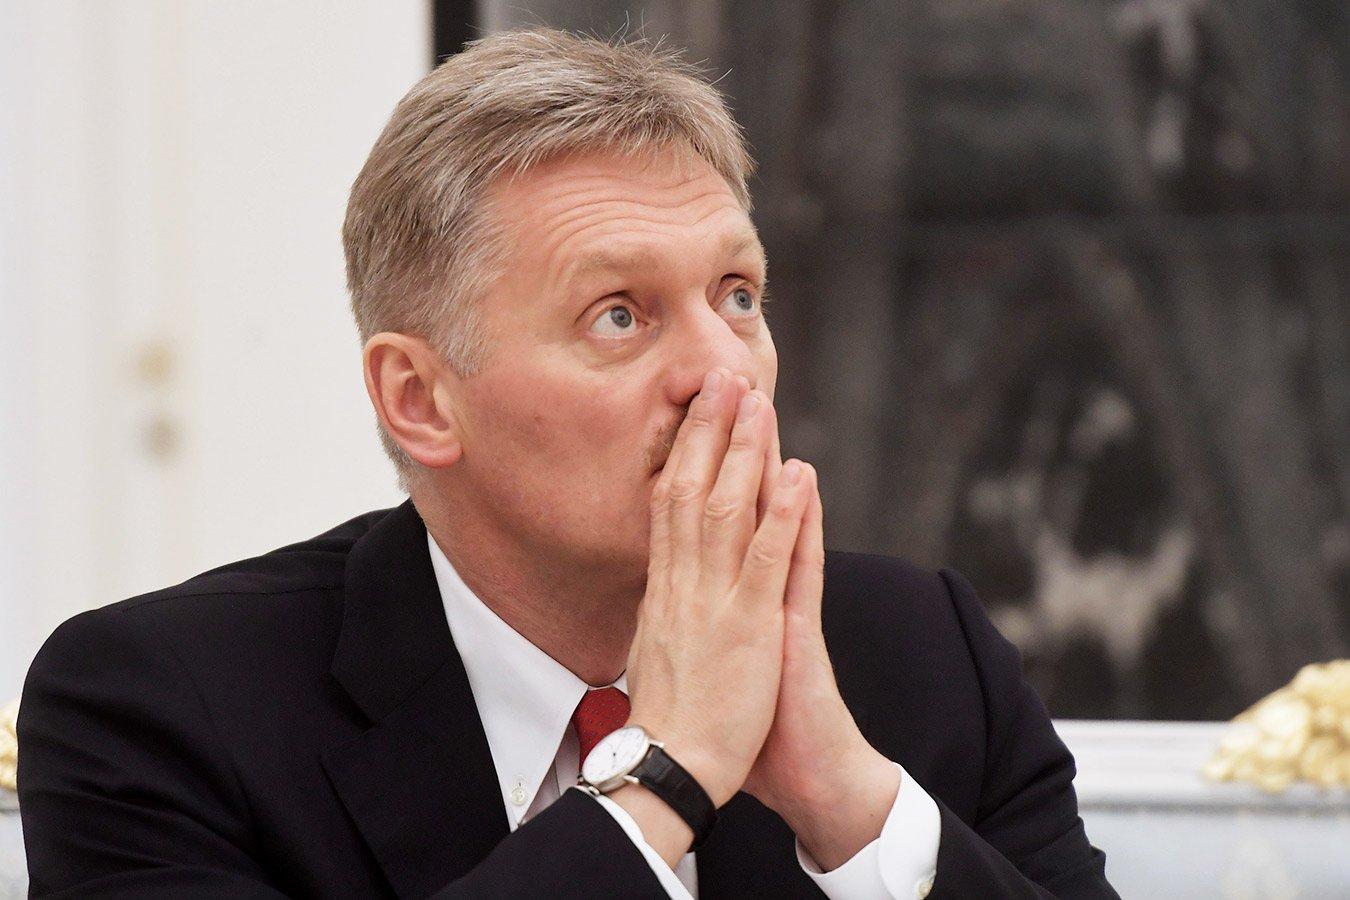 Пресс-секретарь Путина отреагировал на скандал с флагом Беларуси в Риге